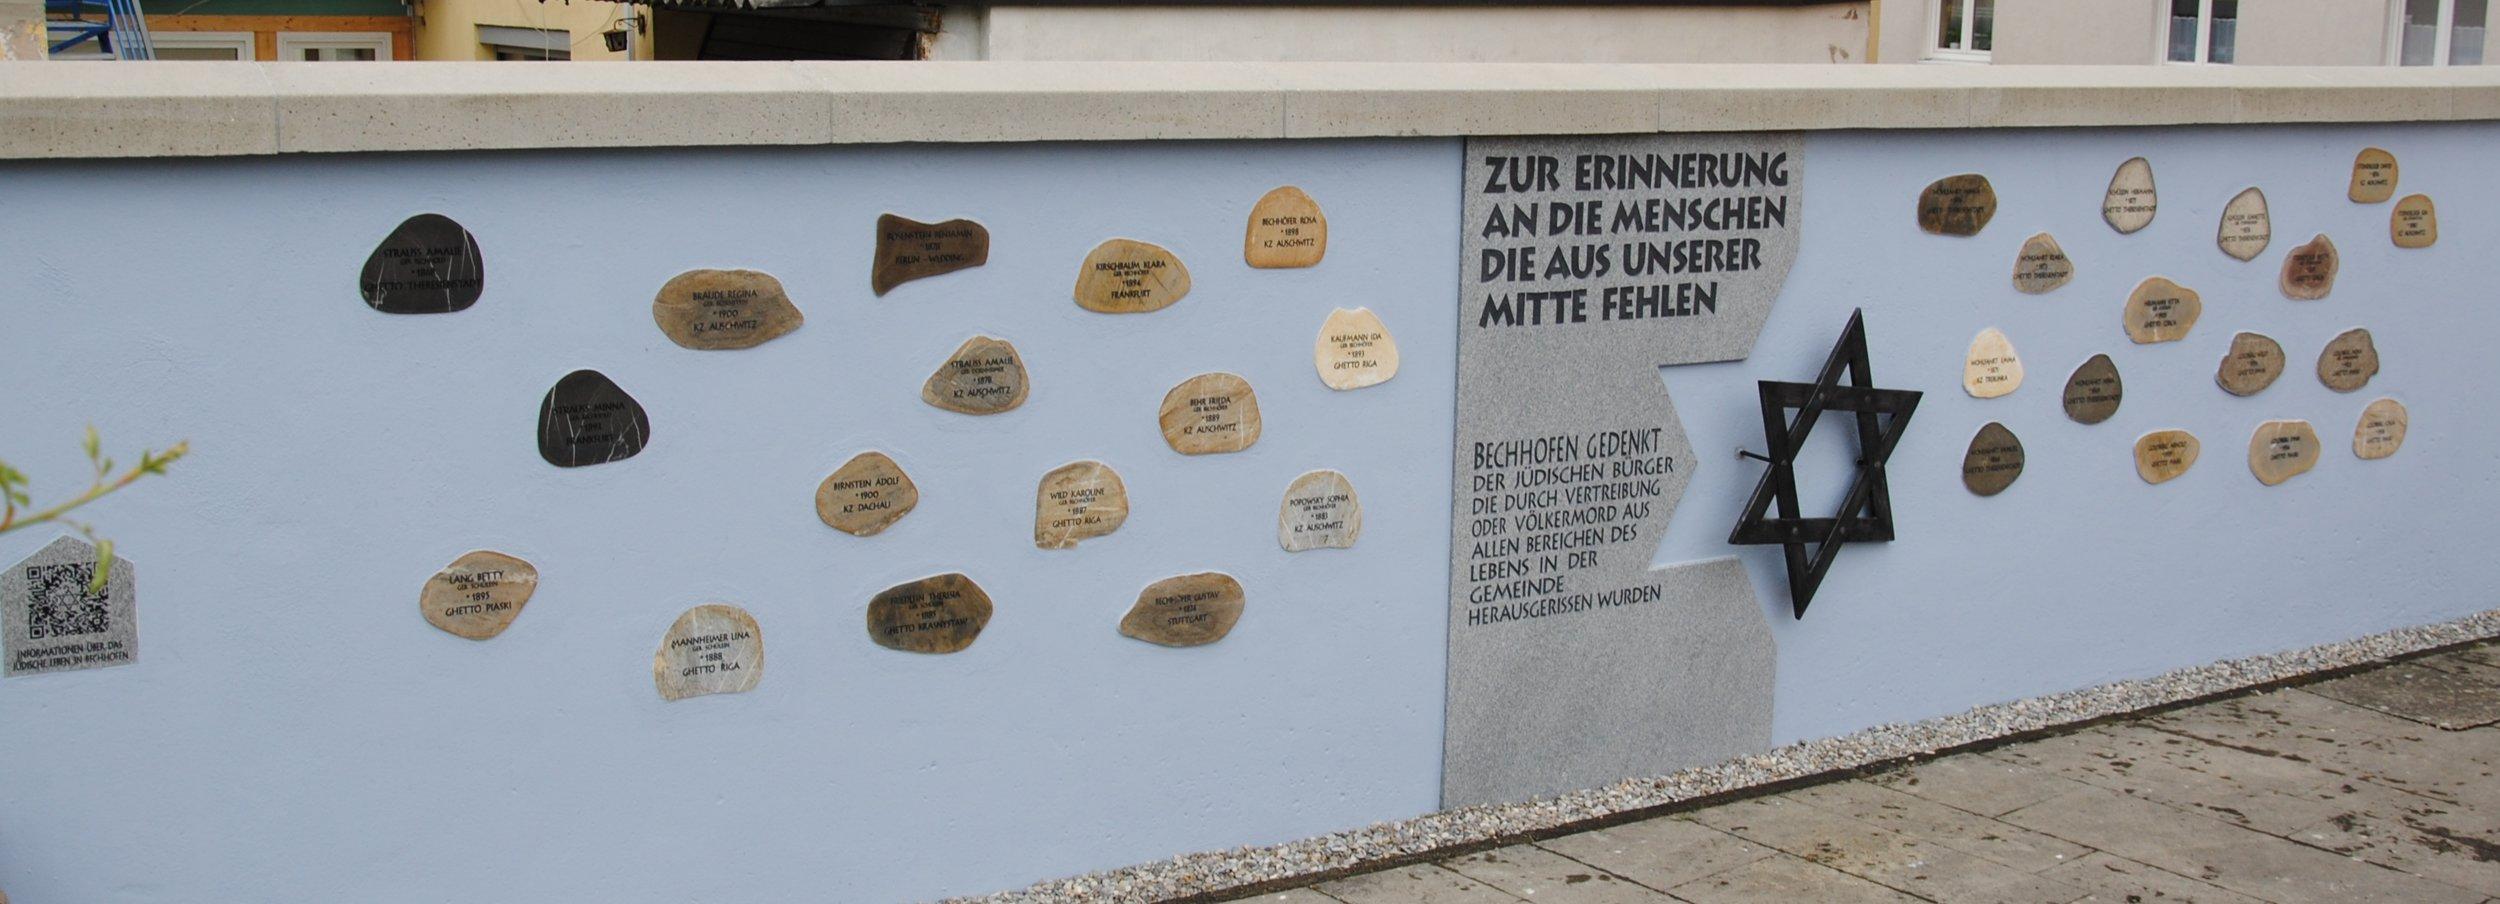 Denkmal Bechhofen. Foto: Claudia Dommel